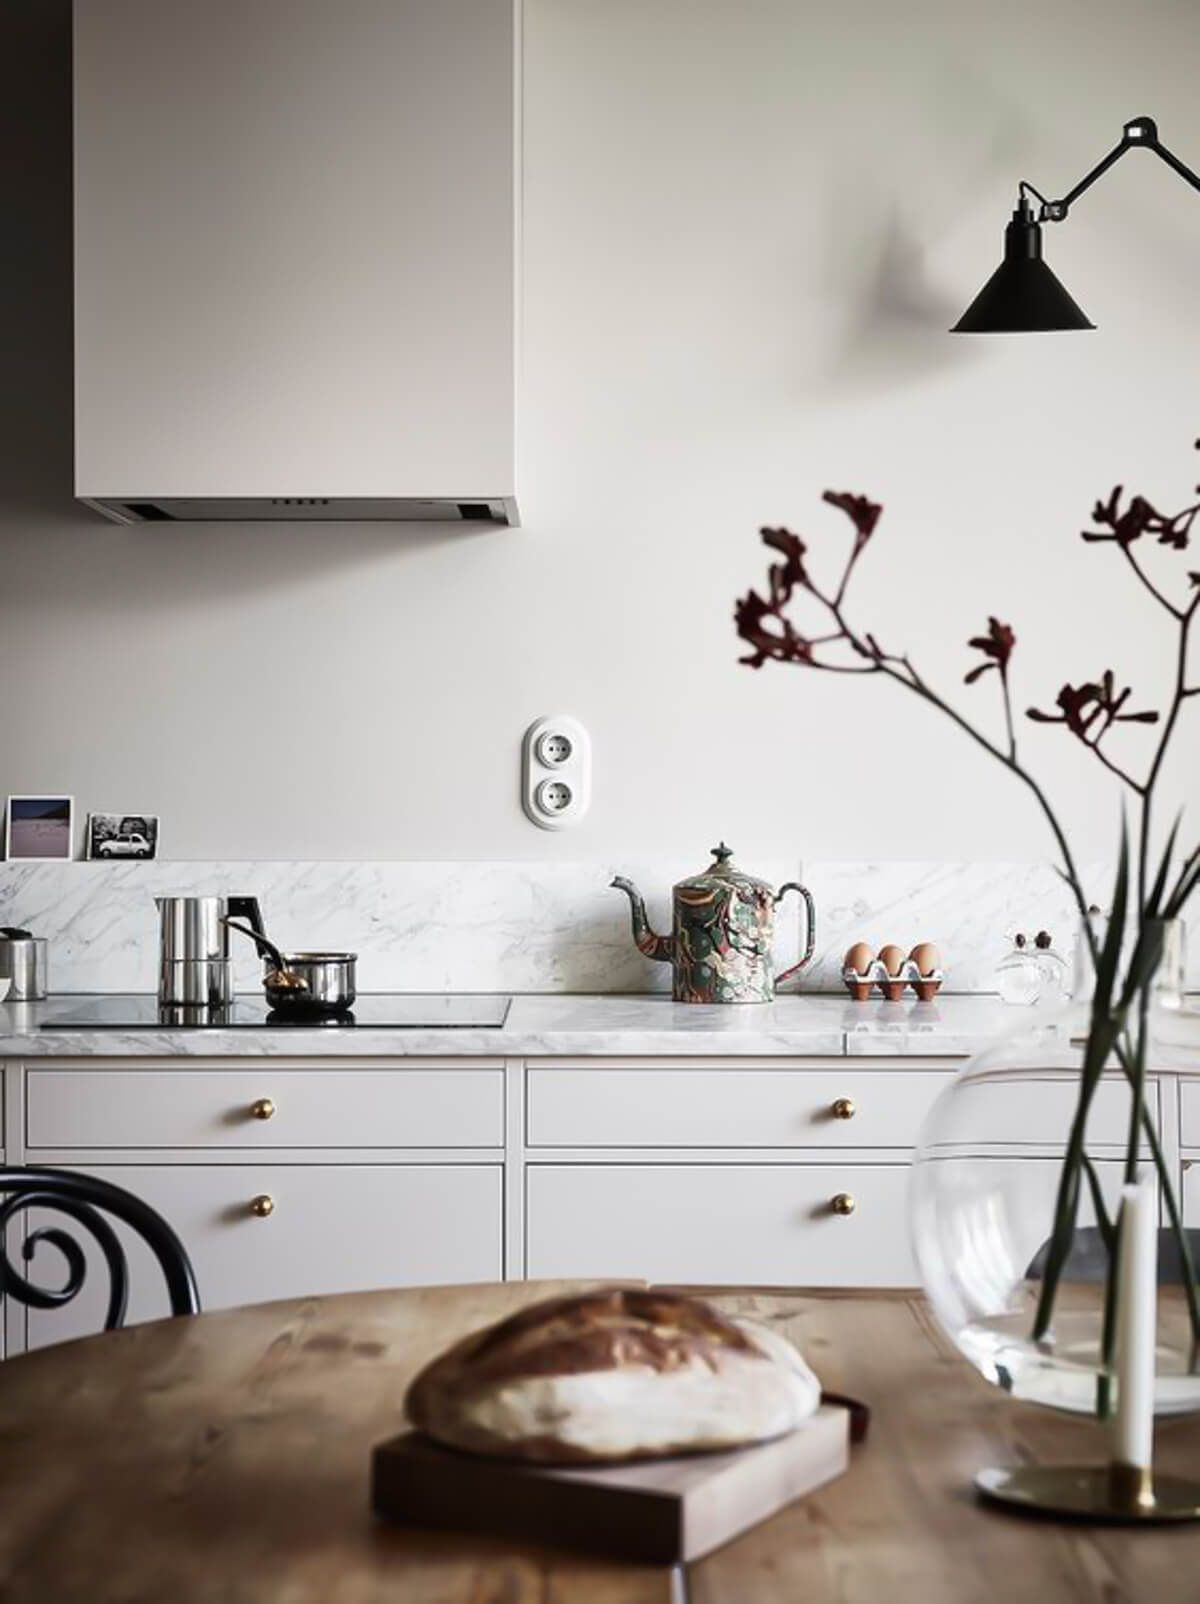 A Cozy Kitchen Kitchen Renovation Part 1 A Cozy Kitchen Scandinavian Kitchen Kitchen Renovation Kitchen Remodel